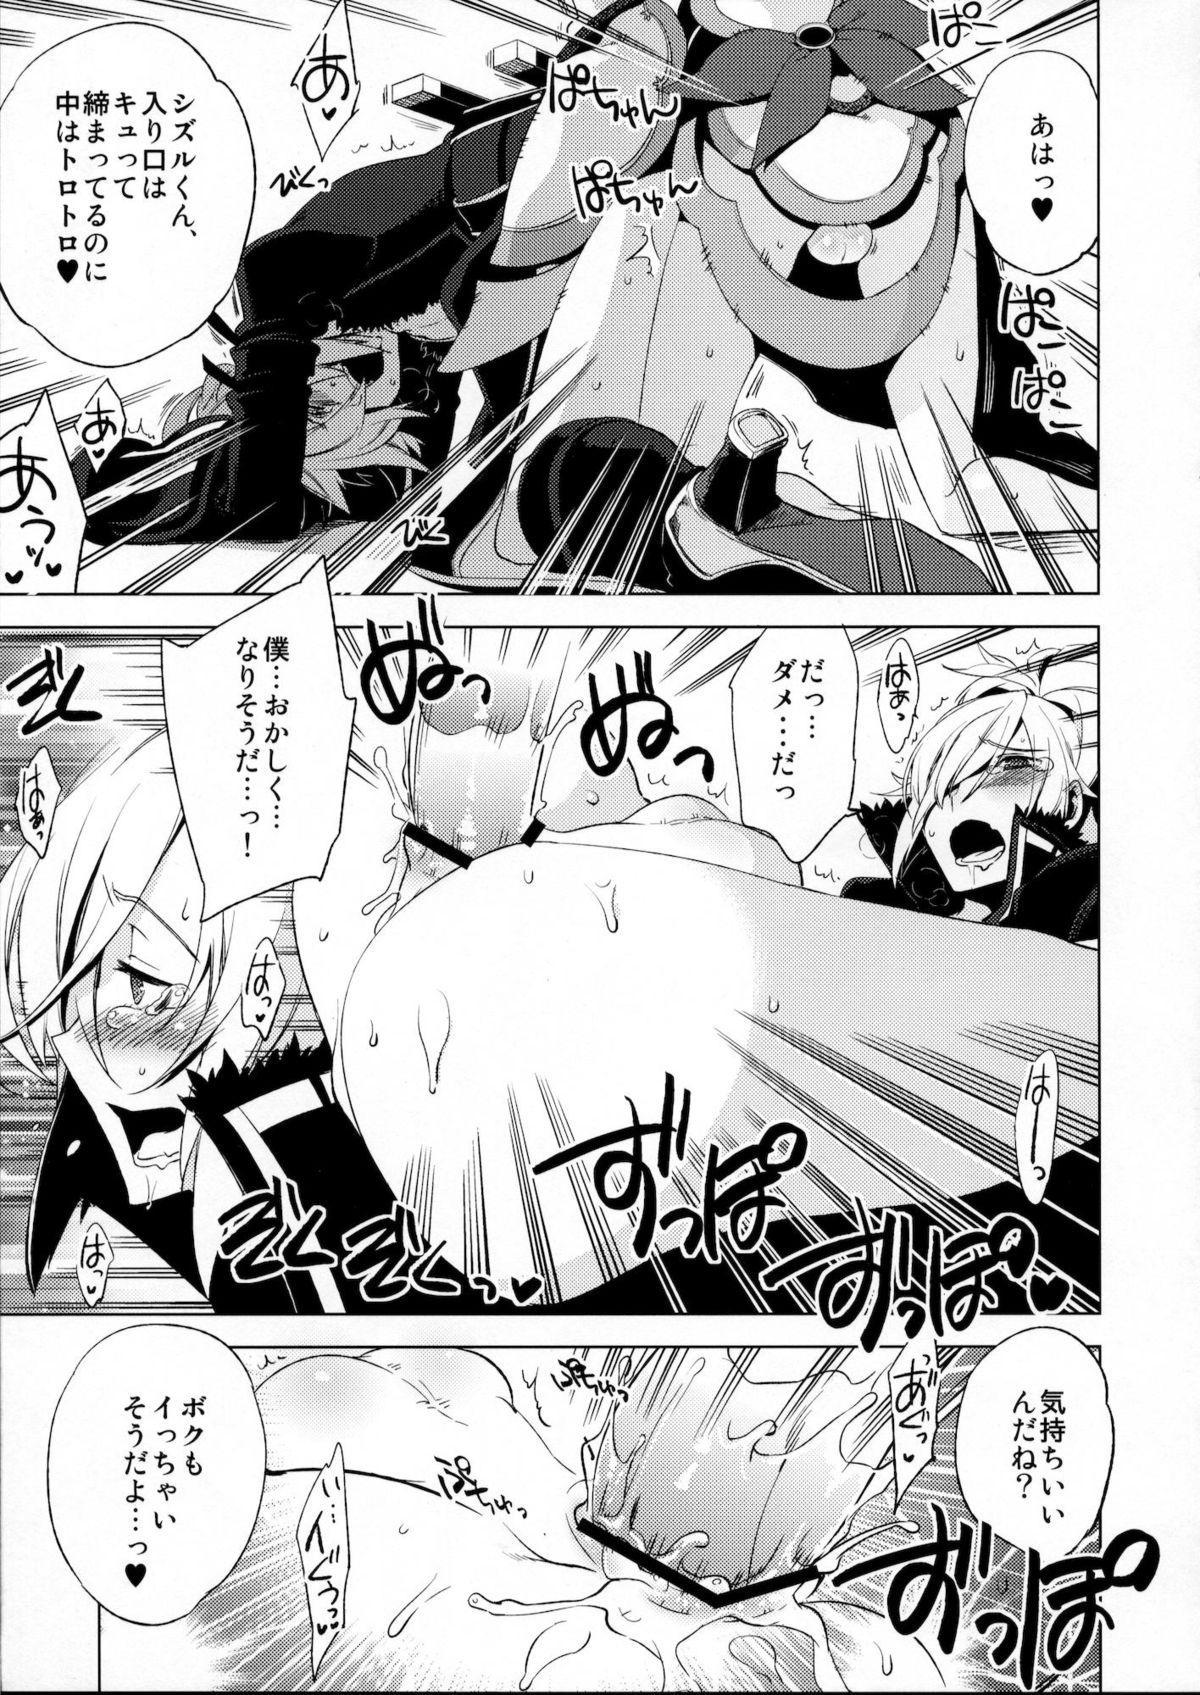 Korizu ni Josou Shounen Hon 6 Sizzle Infinity! 13